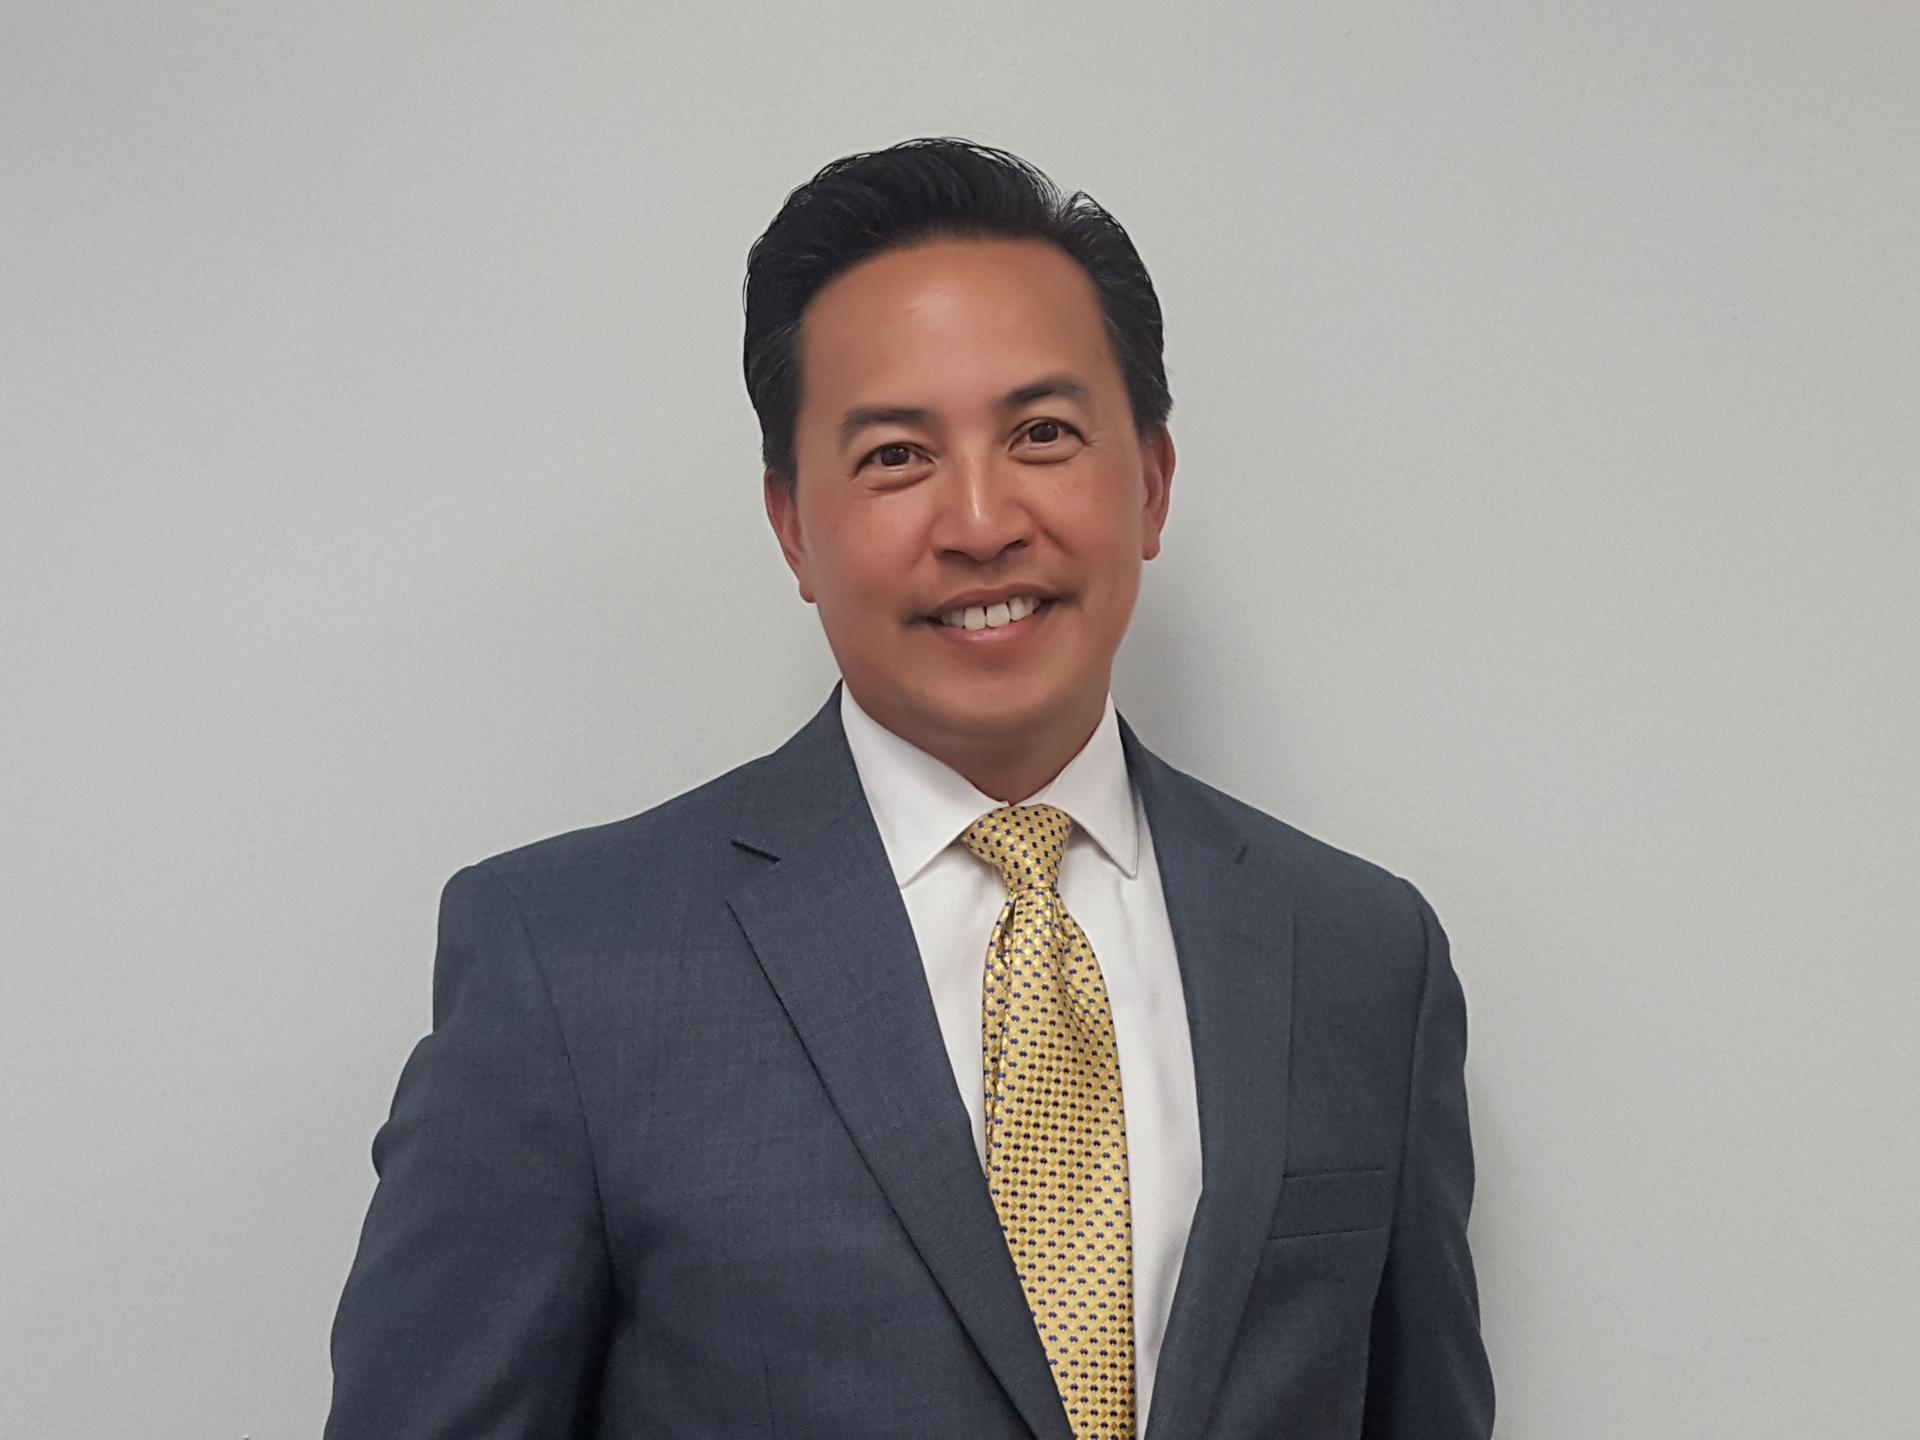 Dr. Froilan N. Mendoza, Superintendent